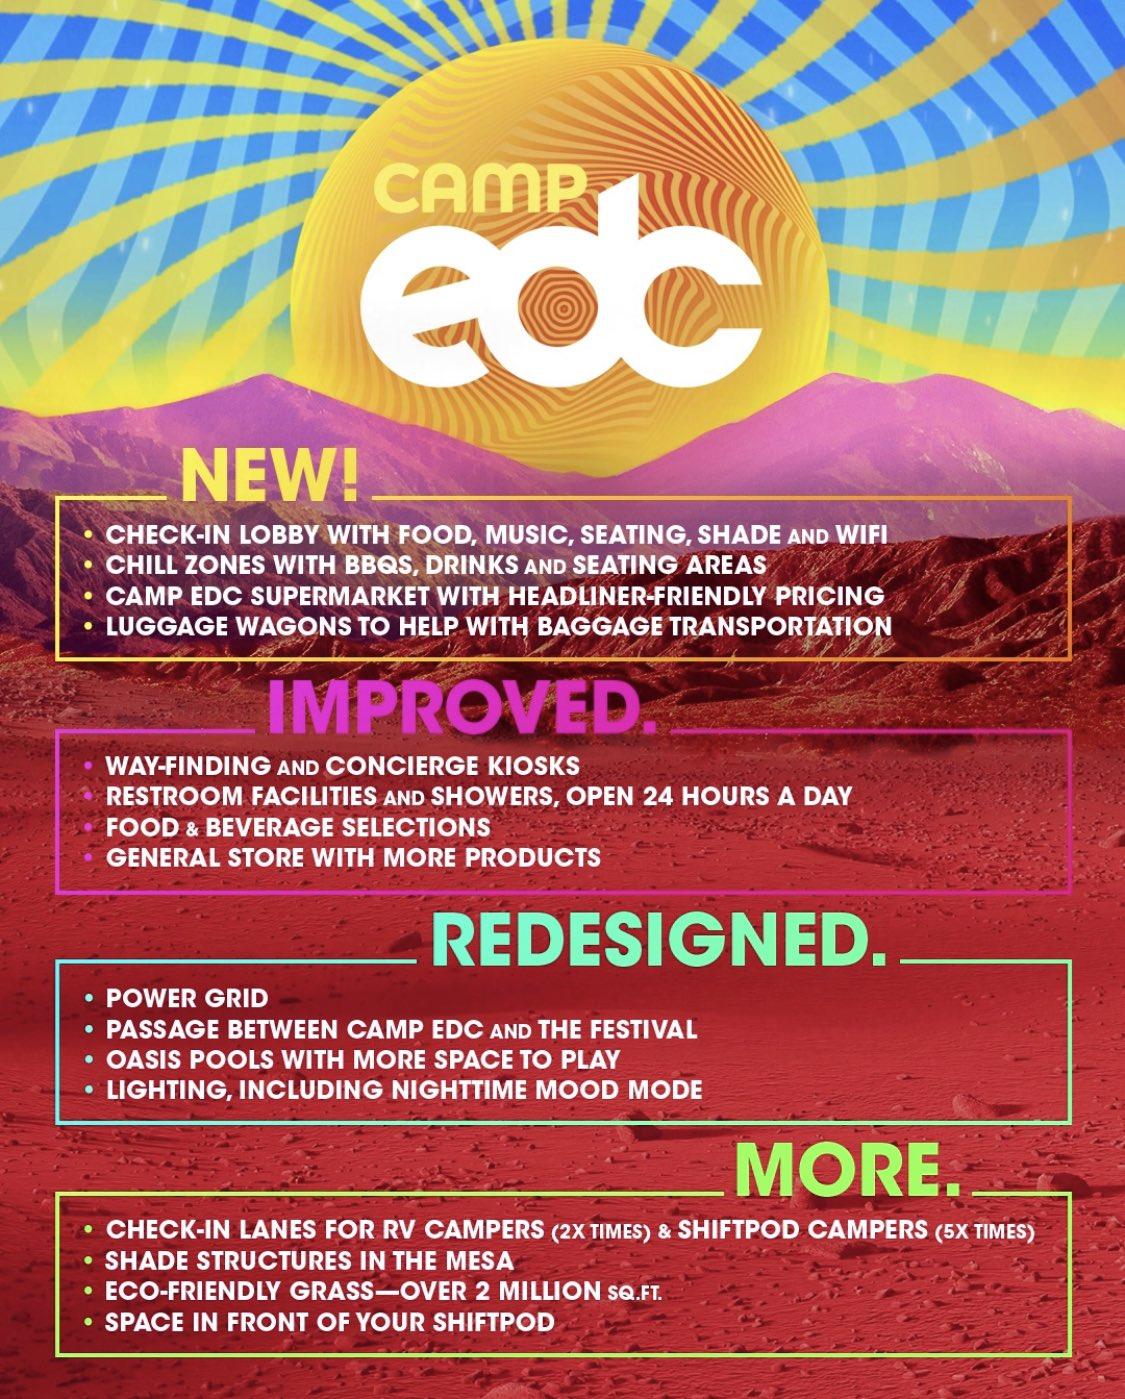 camp-edc-2019-2